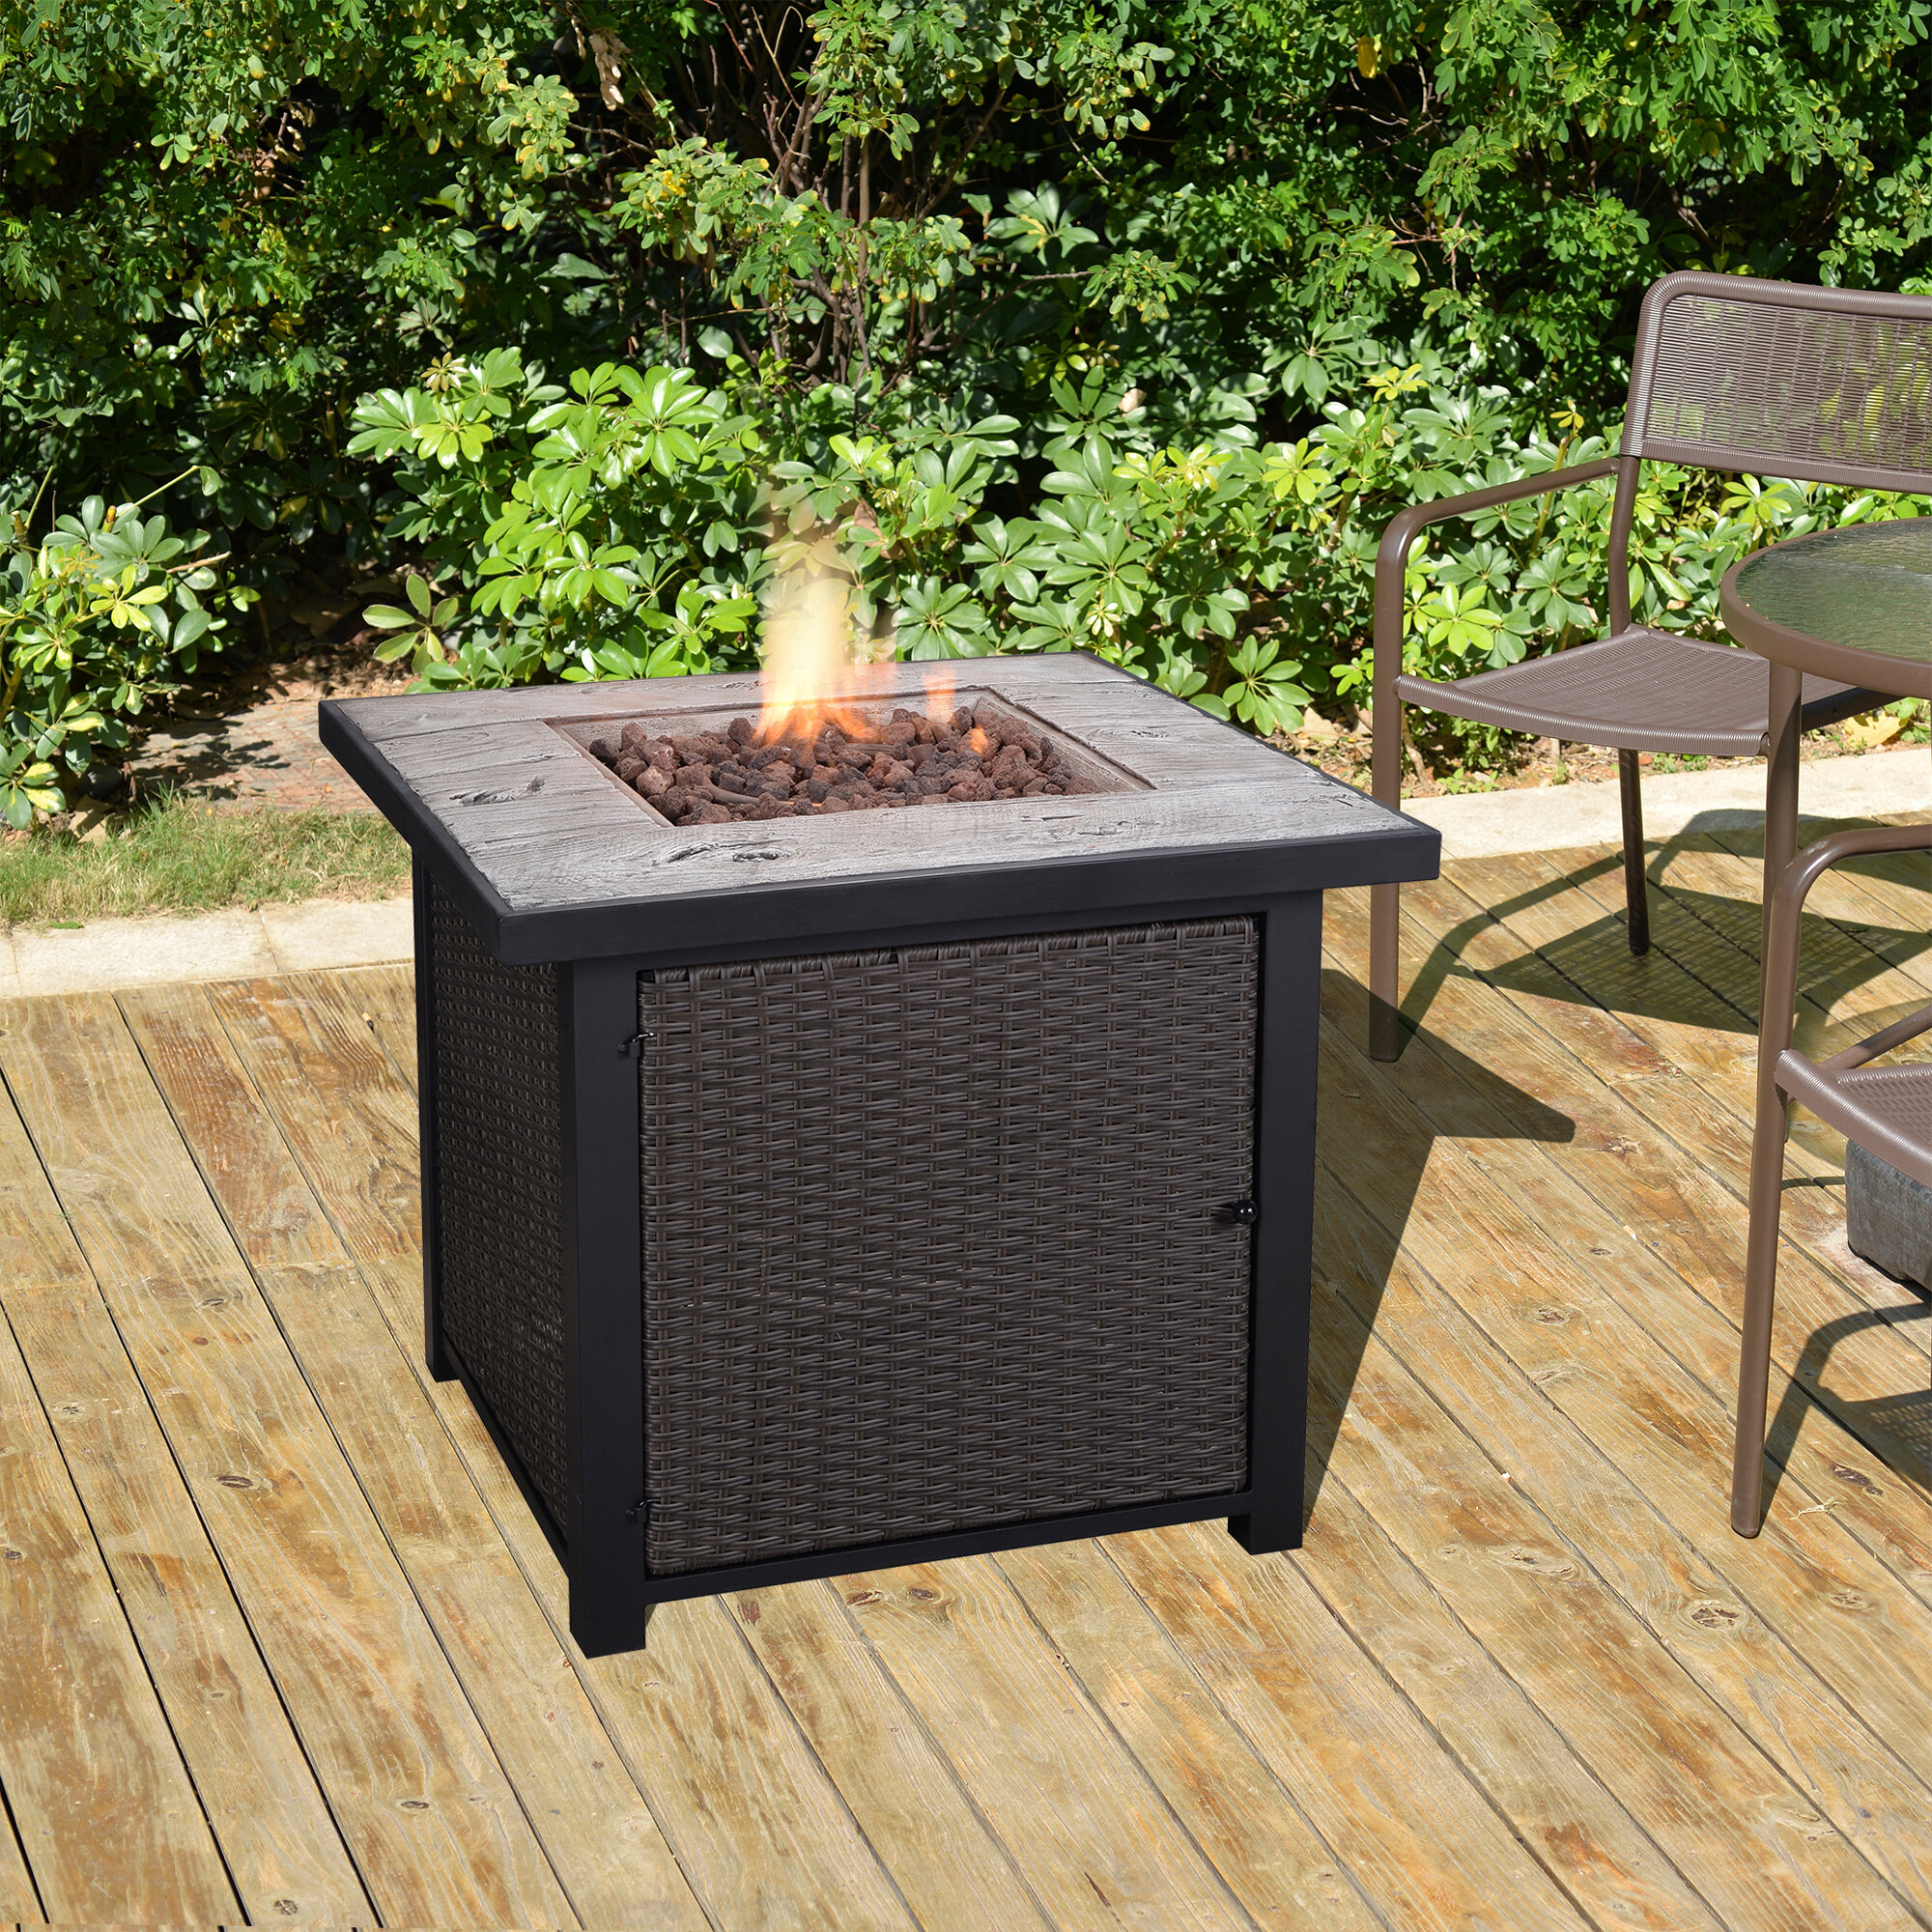 Peaktop outdoor propane gas fire pit table wayfair